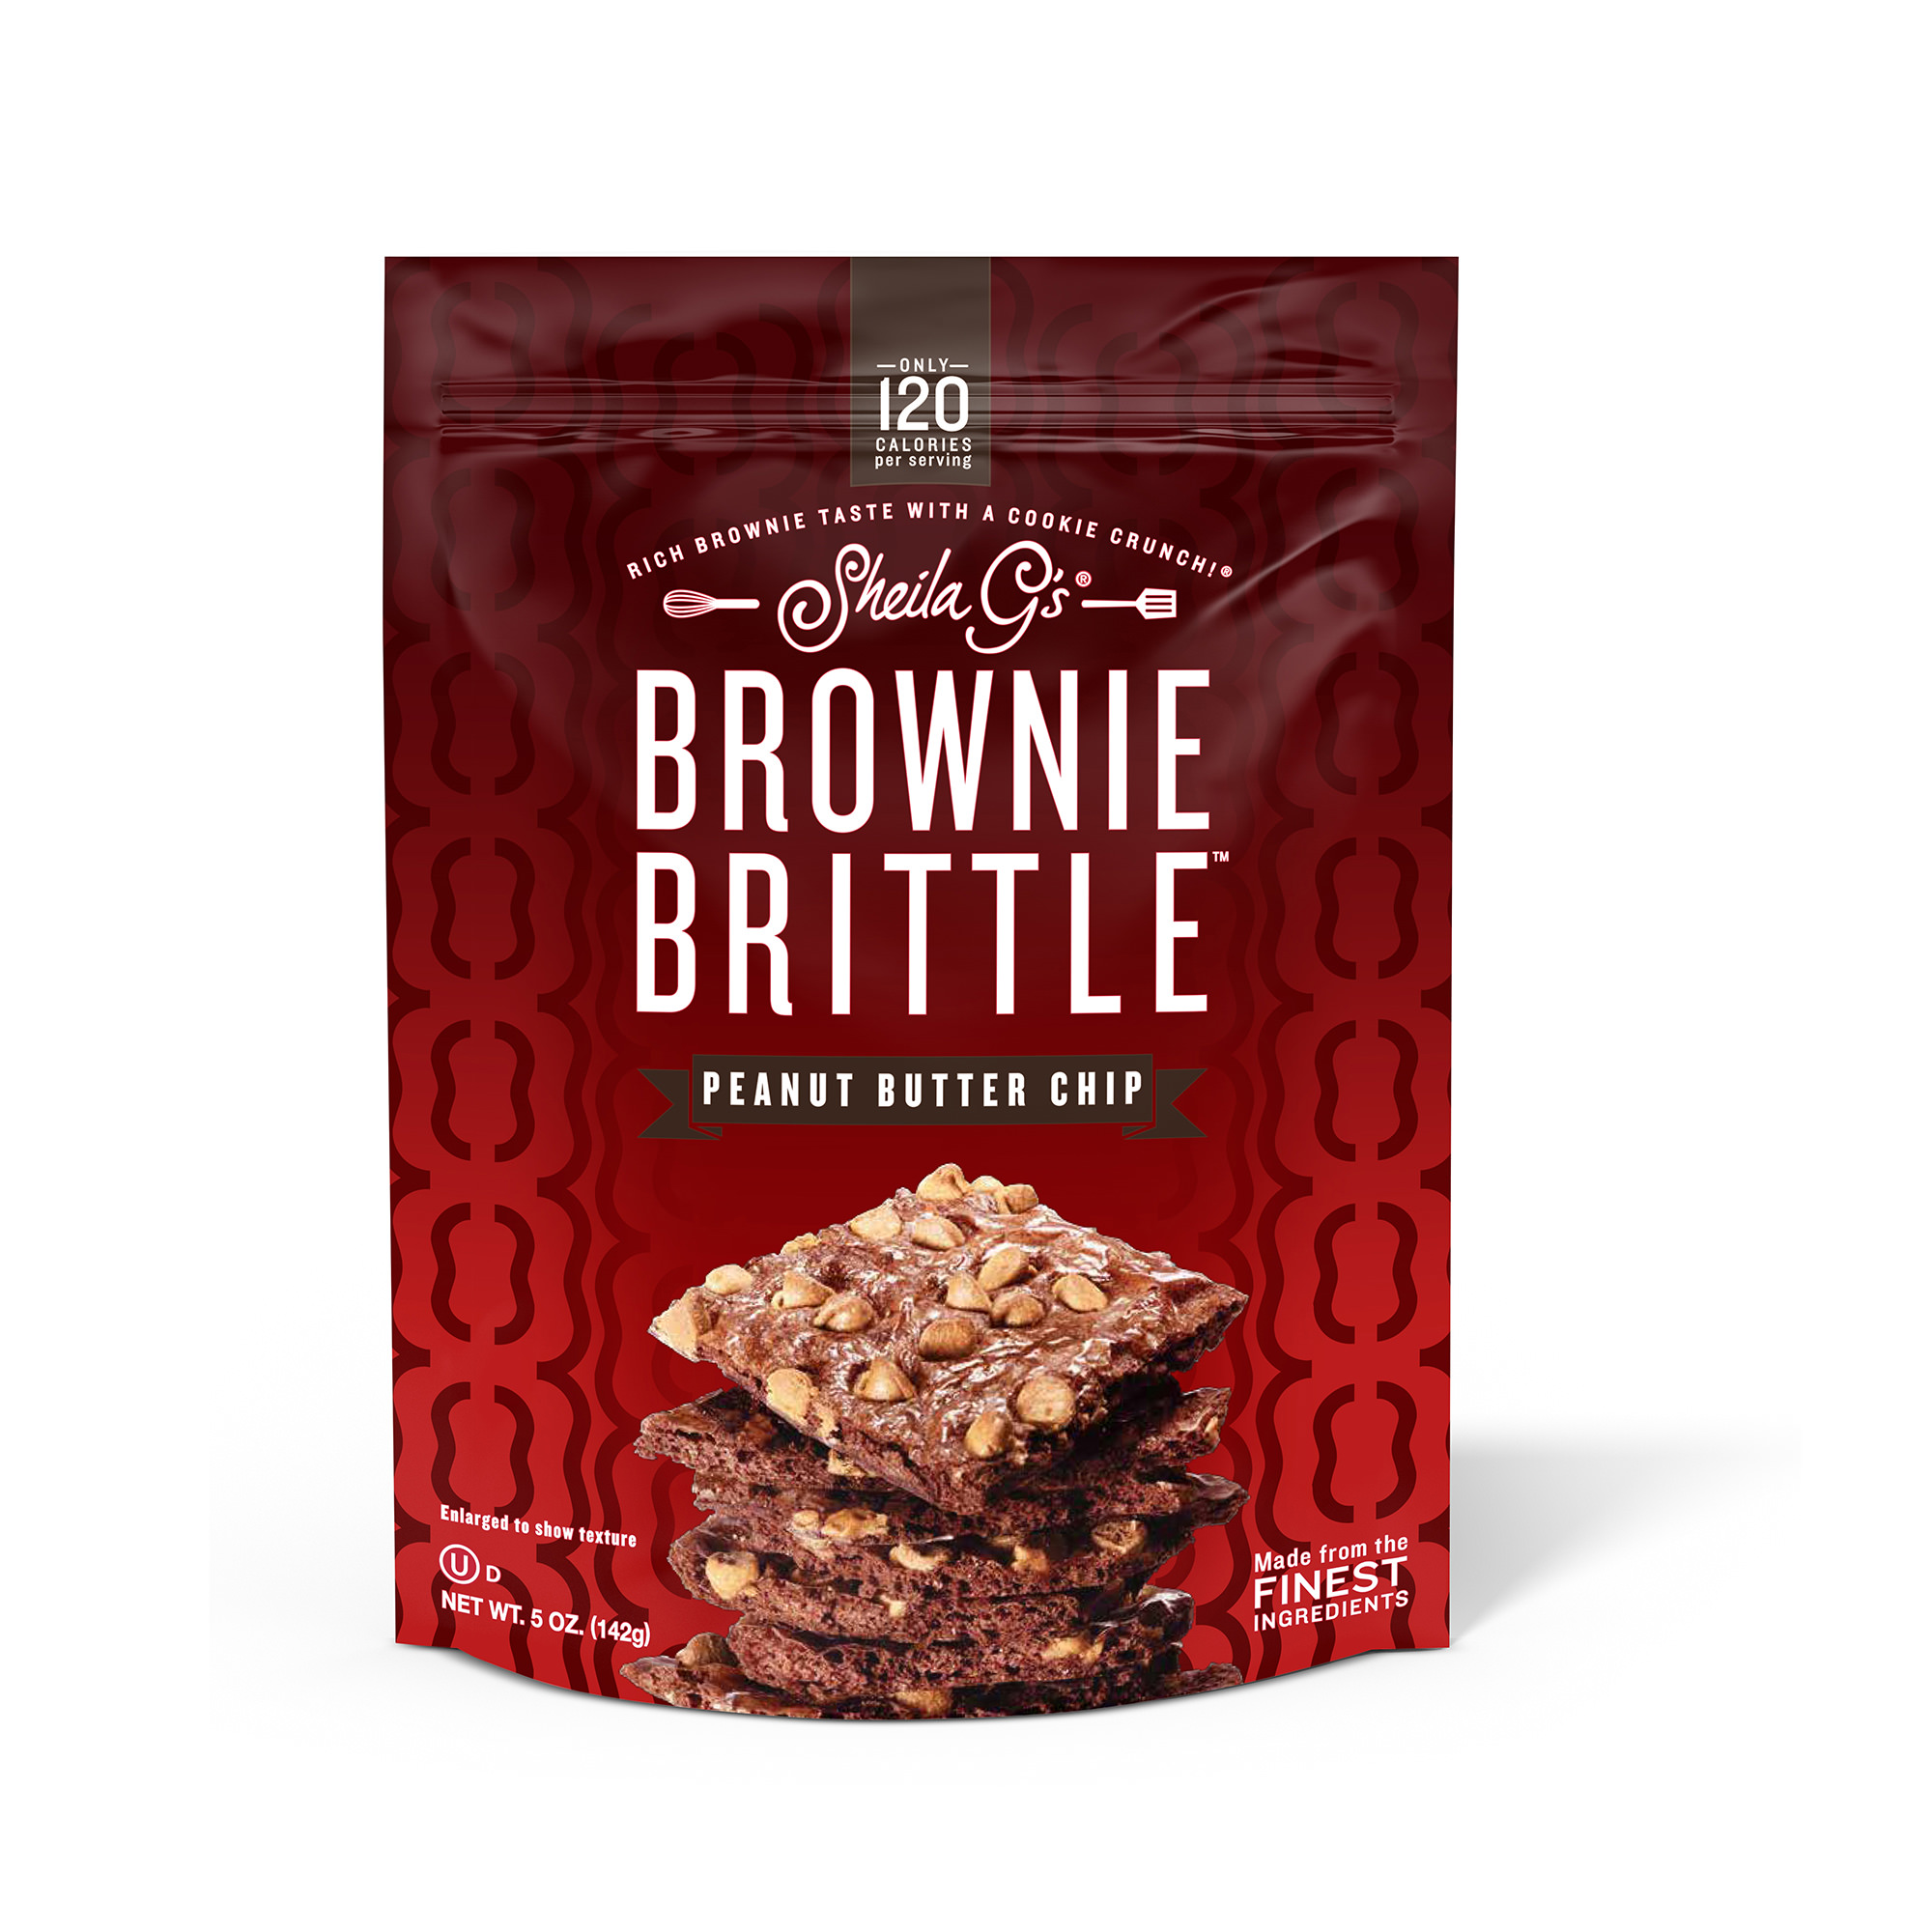 Sheila G's Brownie Brittle Peanut Butter Chip Cookie Snack Thins, 5oz